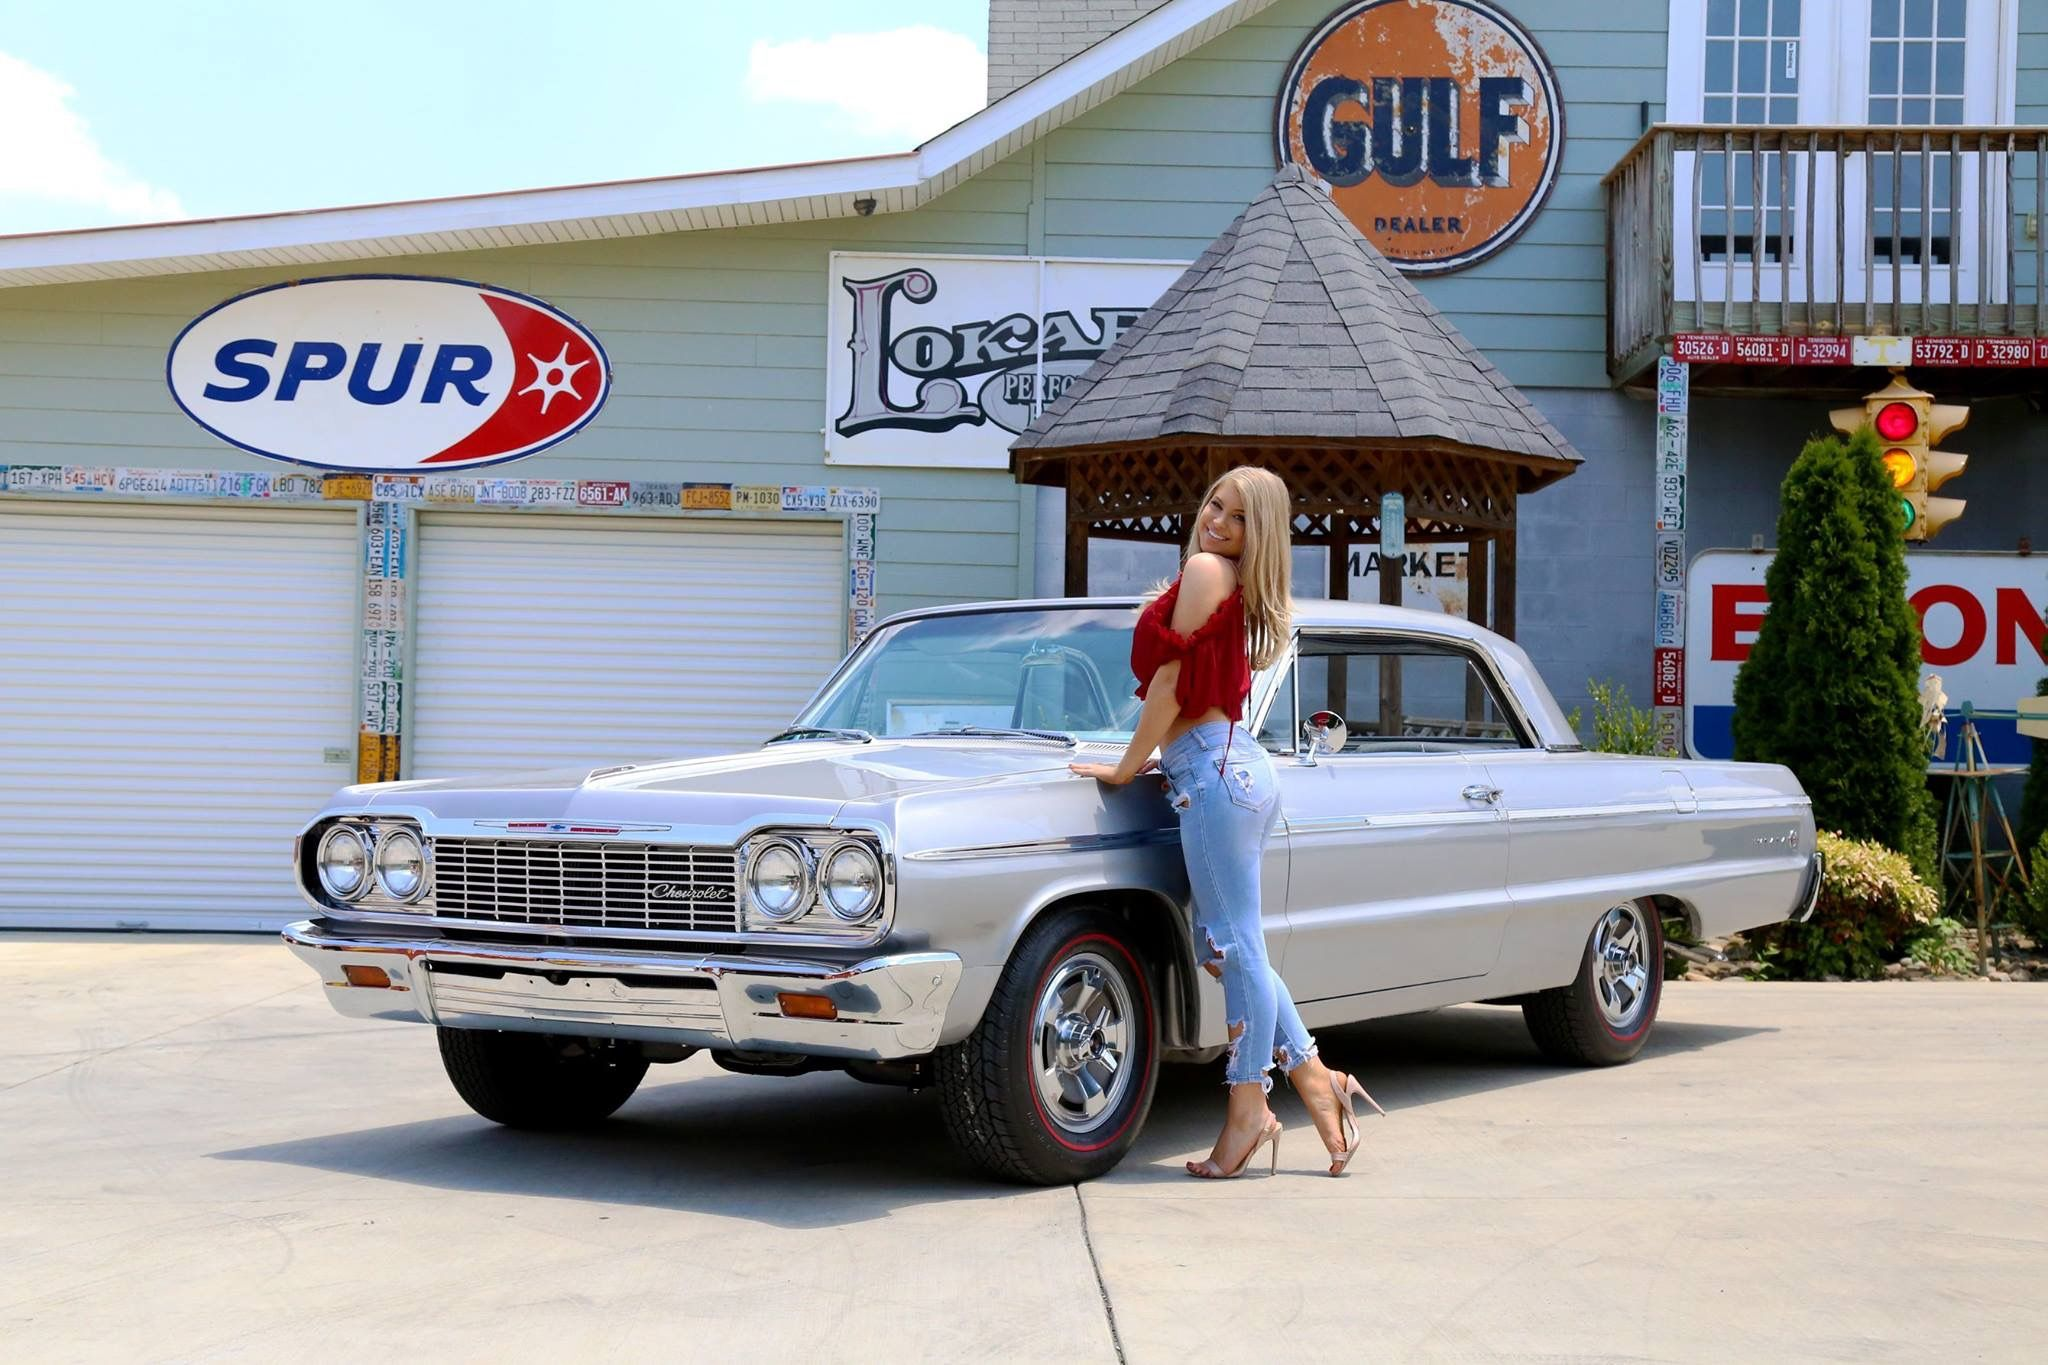 64 Impala Chevrolet Impala Impala Chevrolet